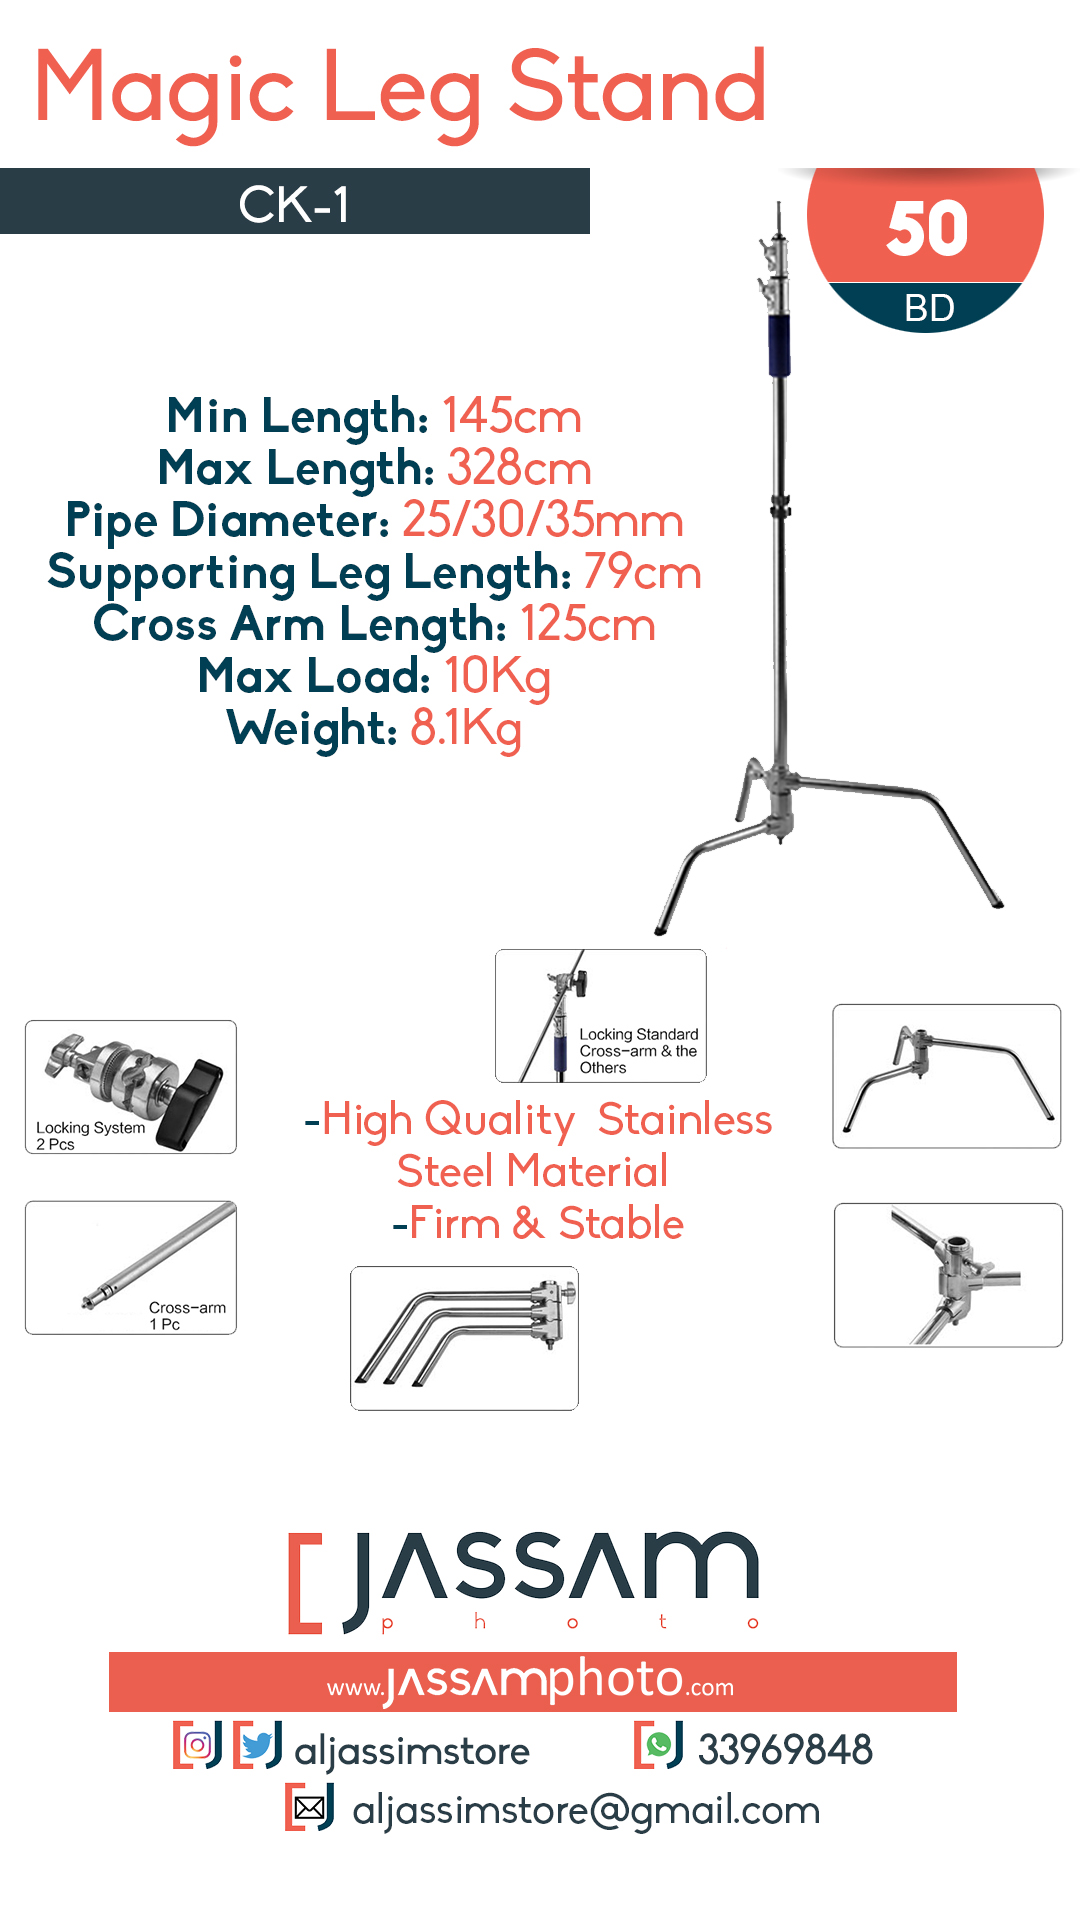 Magic Leg Stand CK-1